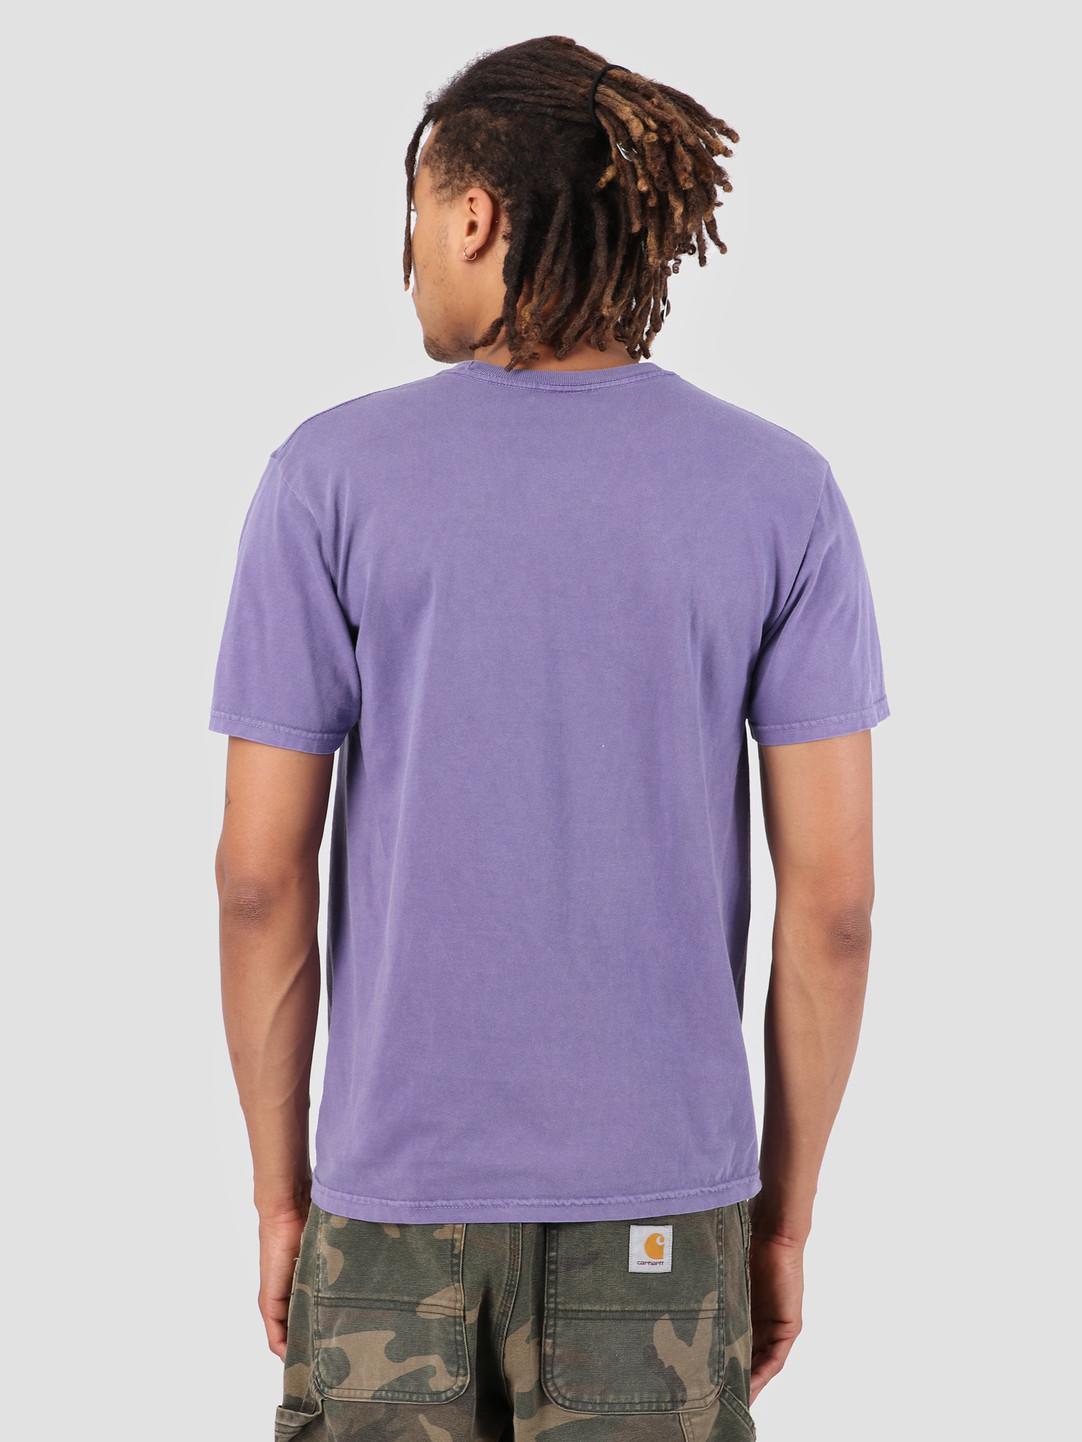 Stussy Stussy Stock Pig. Dyed T-Shirt Purple 0809